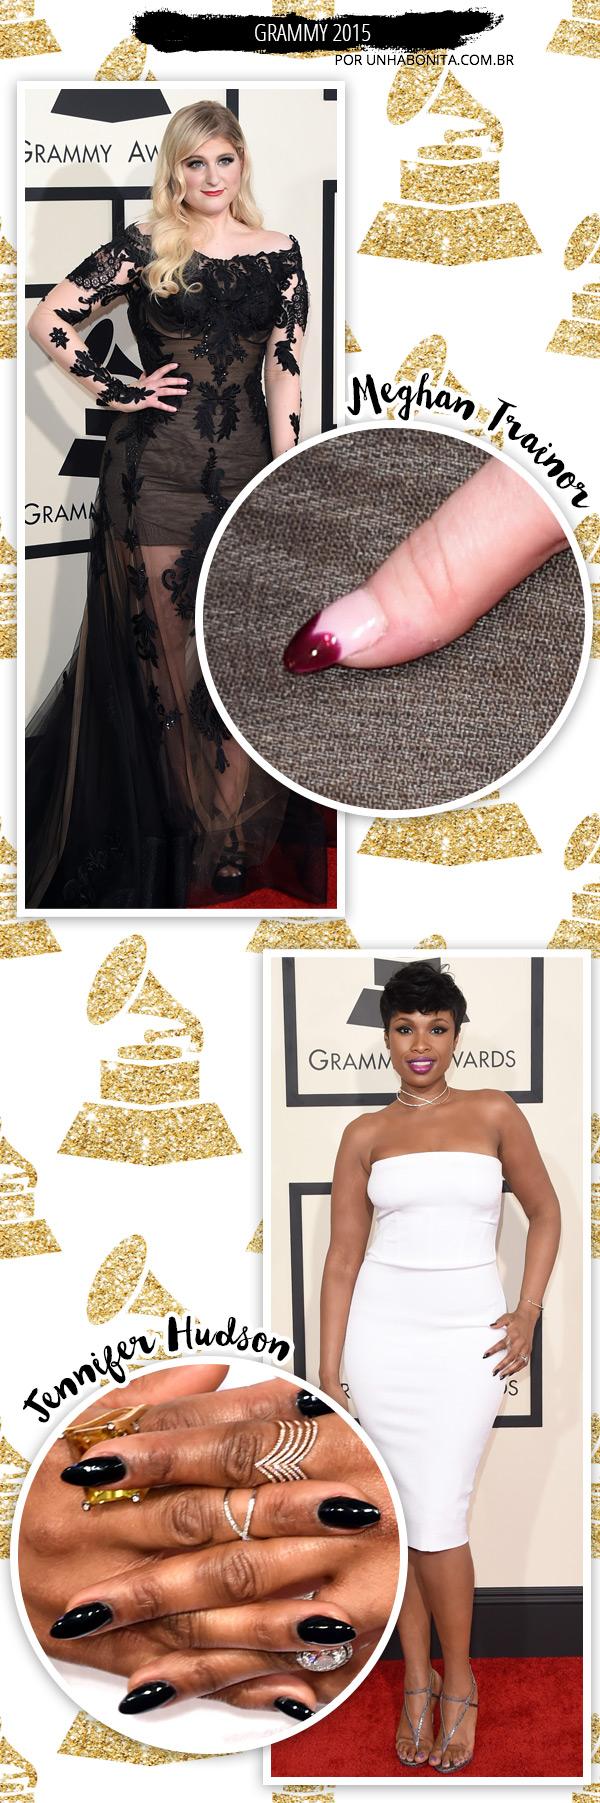 meghan-trainor-jennifer-husdon-grammy-2015-manicure